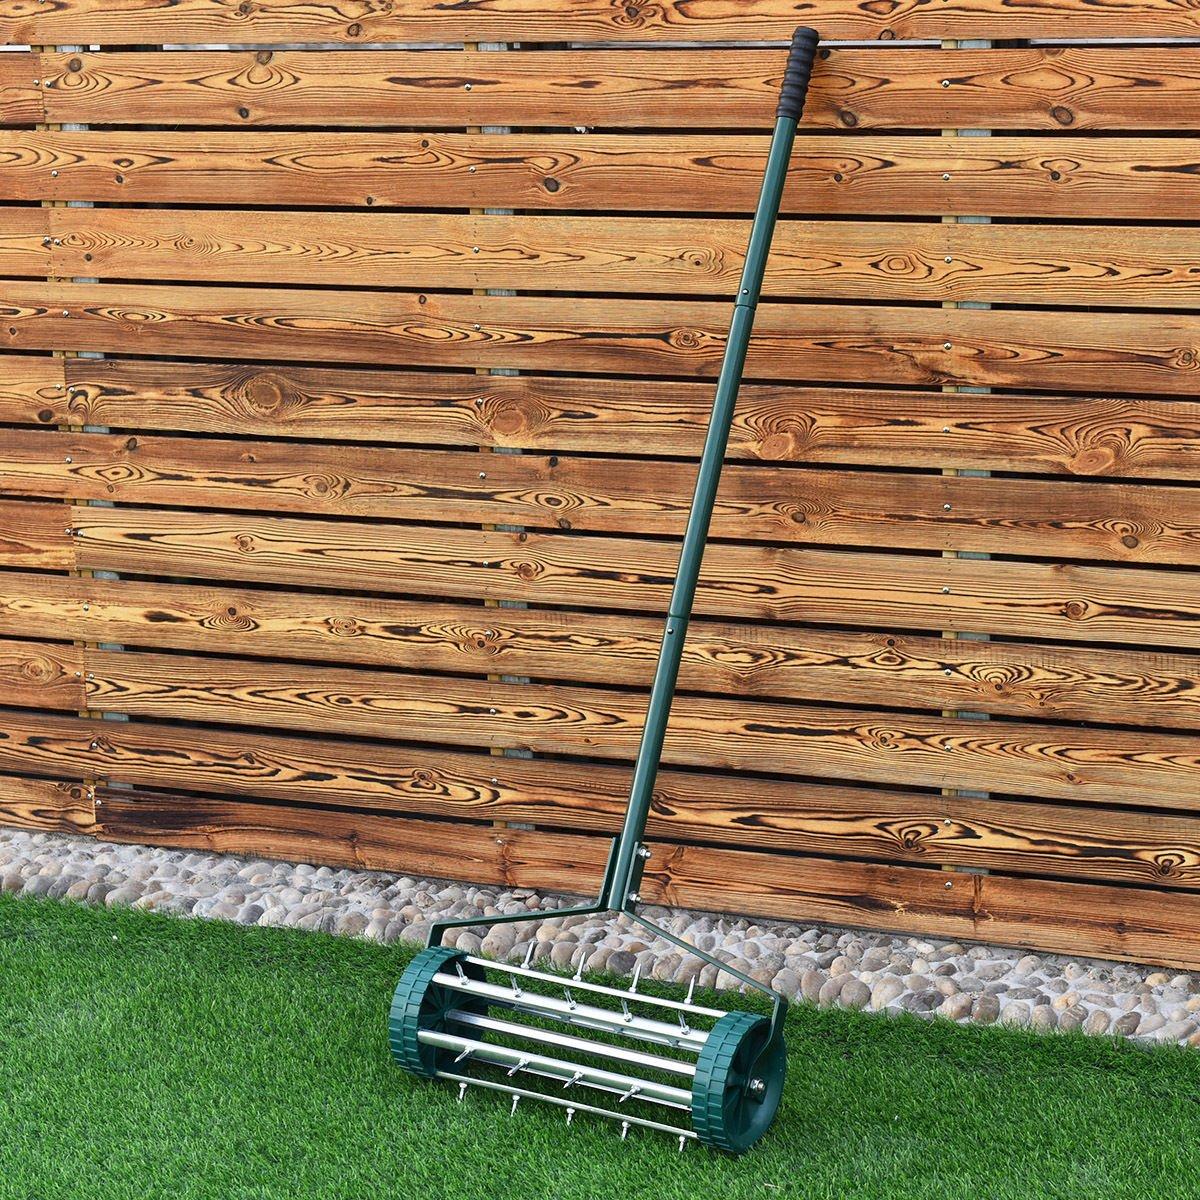 Amazon.com : COLIBROX--Heavy Duty Rolling Garden Lawn Aerator Roller ...